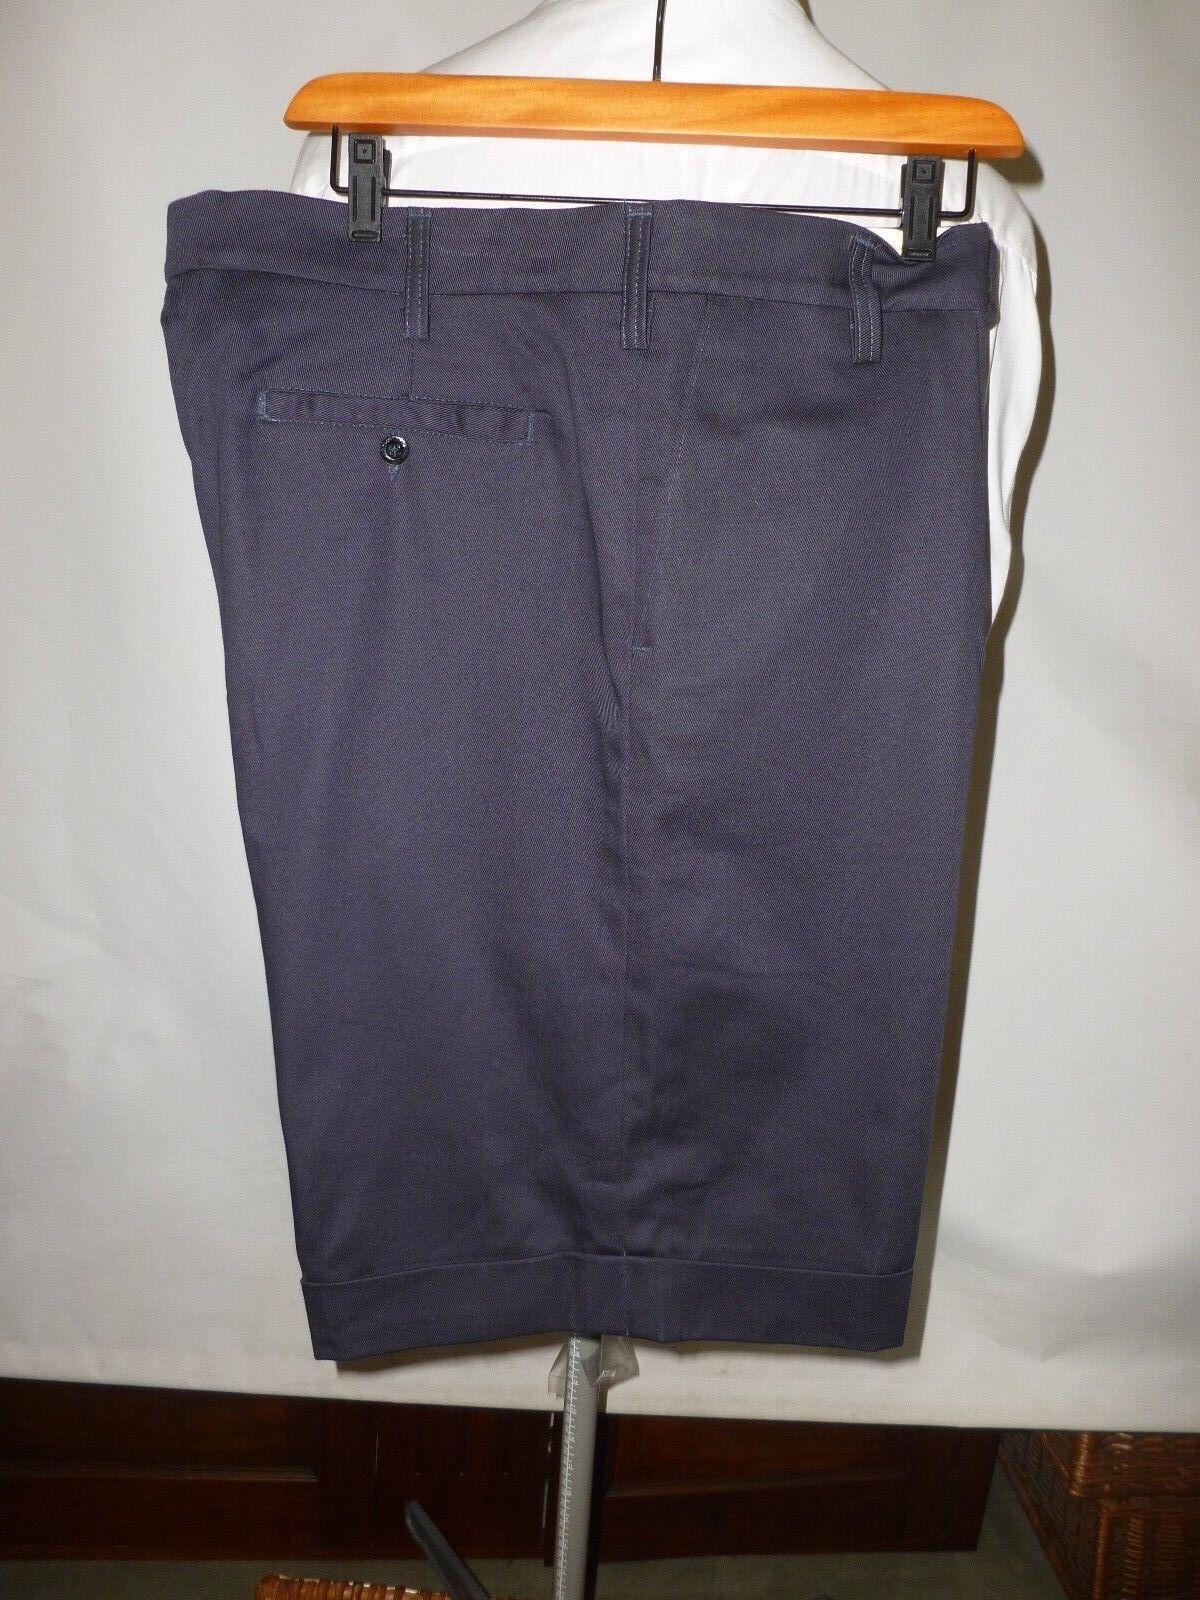 734c0cfef8ef Pakeman Catto   CARTER Blu Navy Cotone Pantaloncini Su Misura 42 Vita ---  NUOVO nntkbl4255-Shorts e bermuda